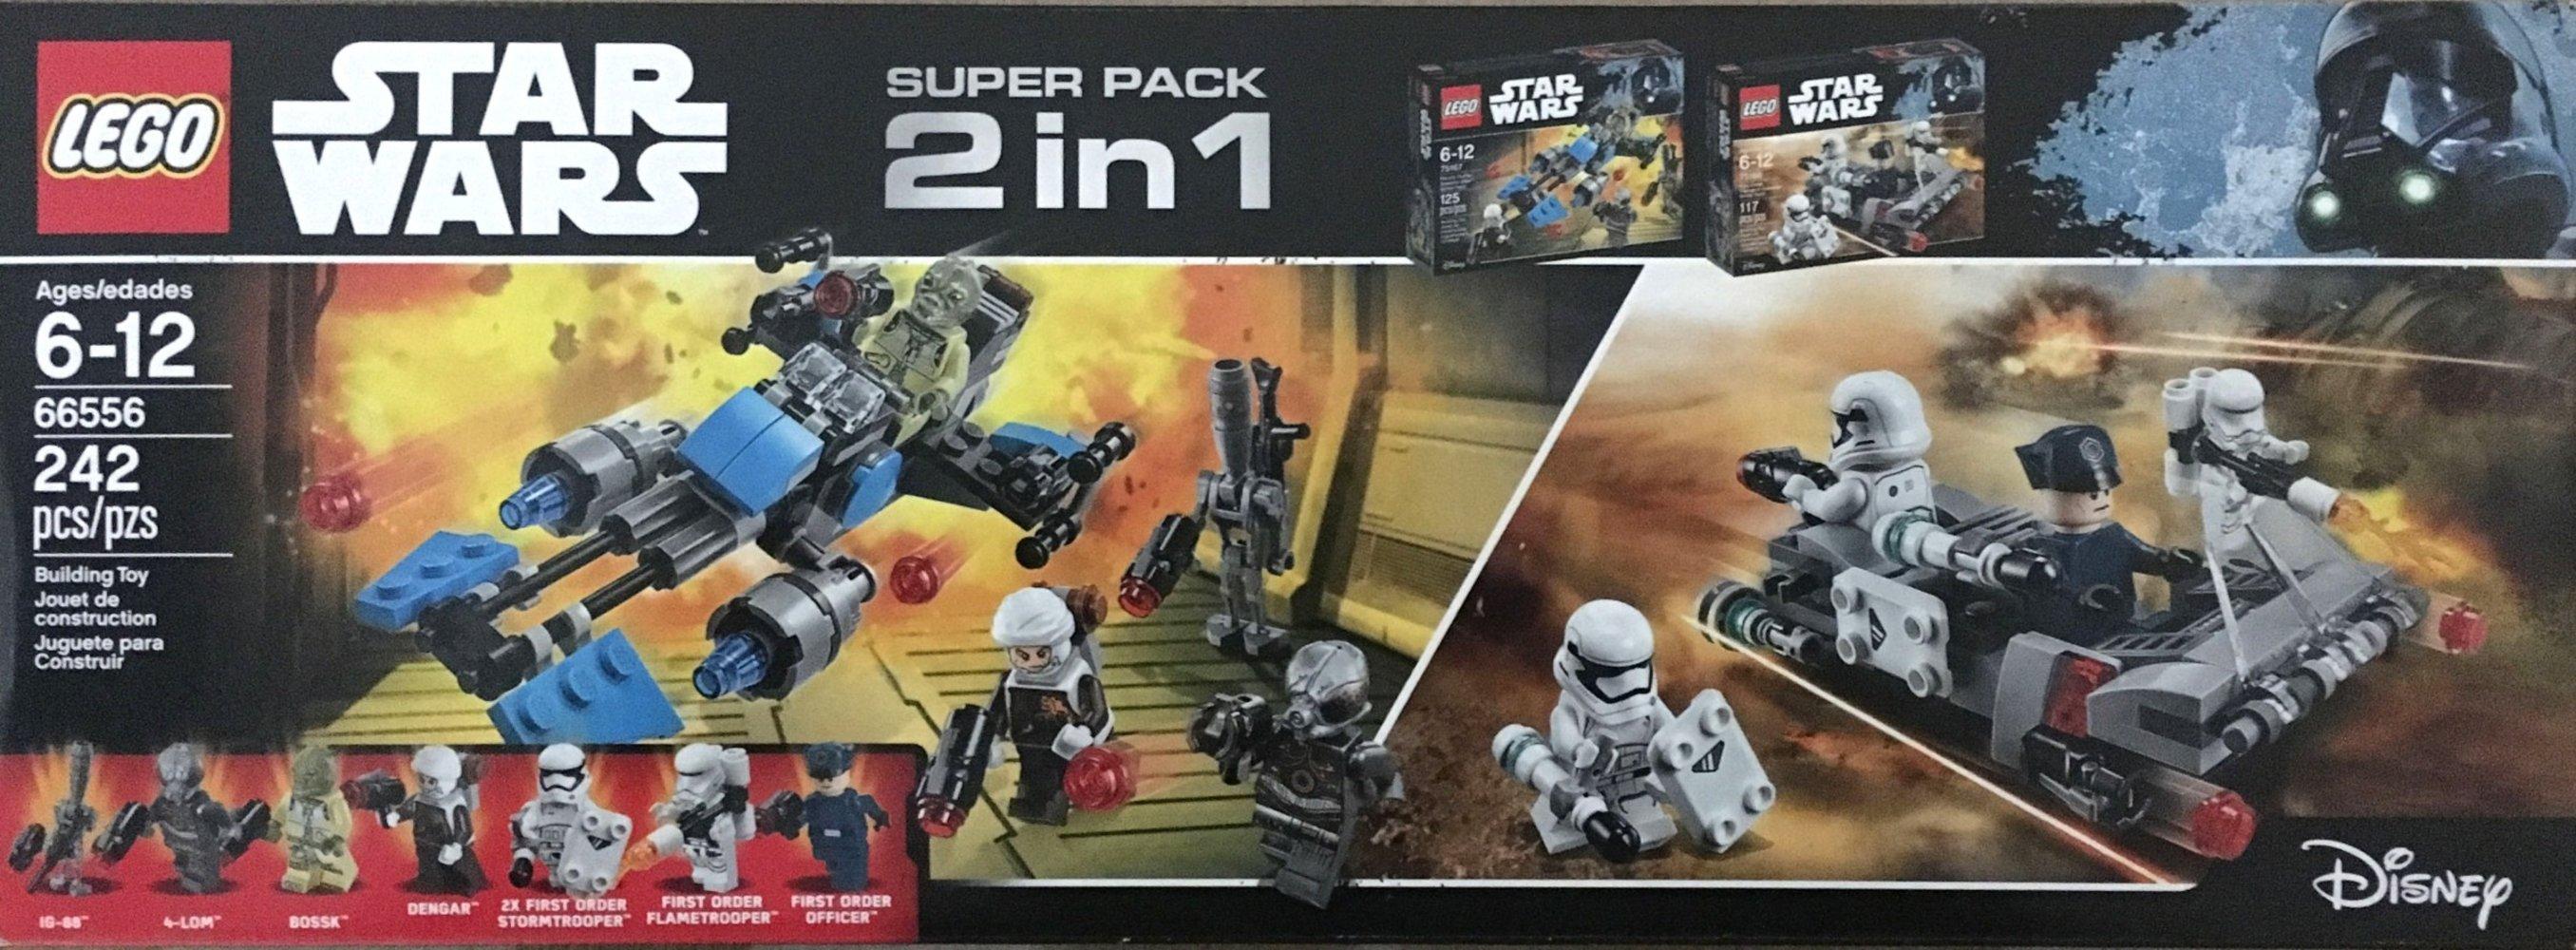 Star Wars Super Pack 2 in 1